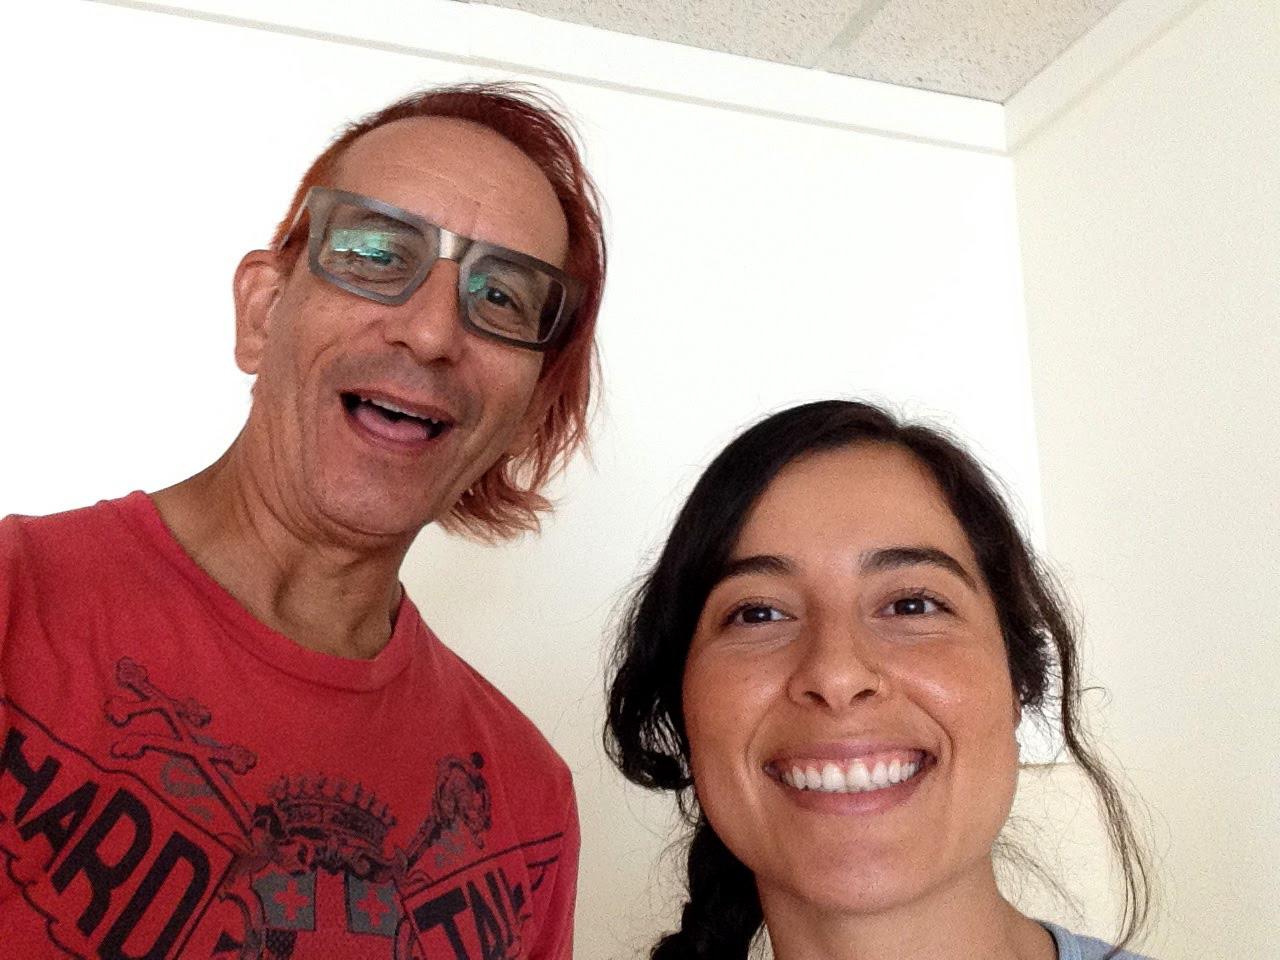 Monday 10 Oct '16 – People's Yoga, East Los Angeles: Noon Flow w Jocelyn Ramirez